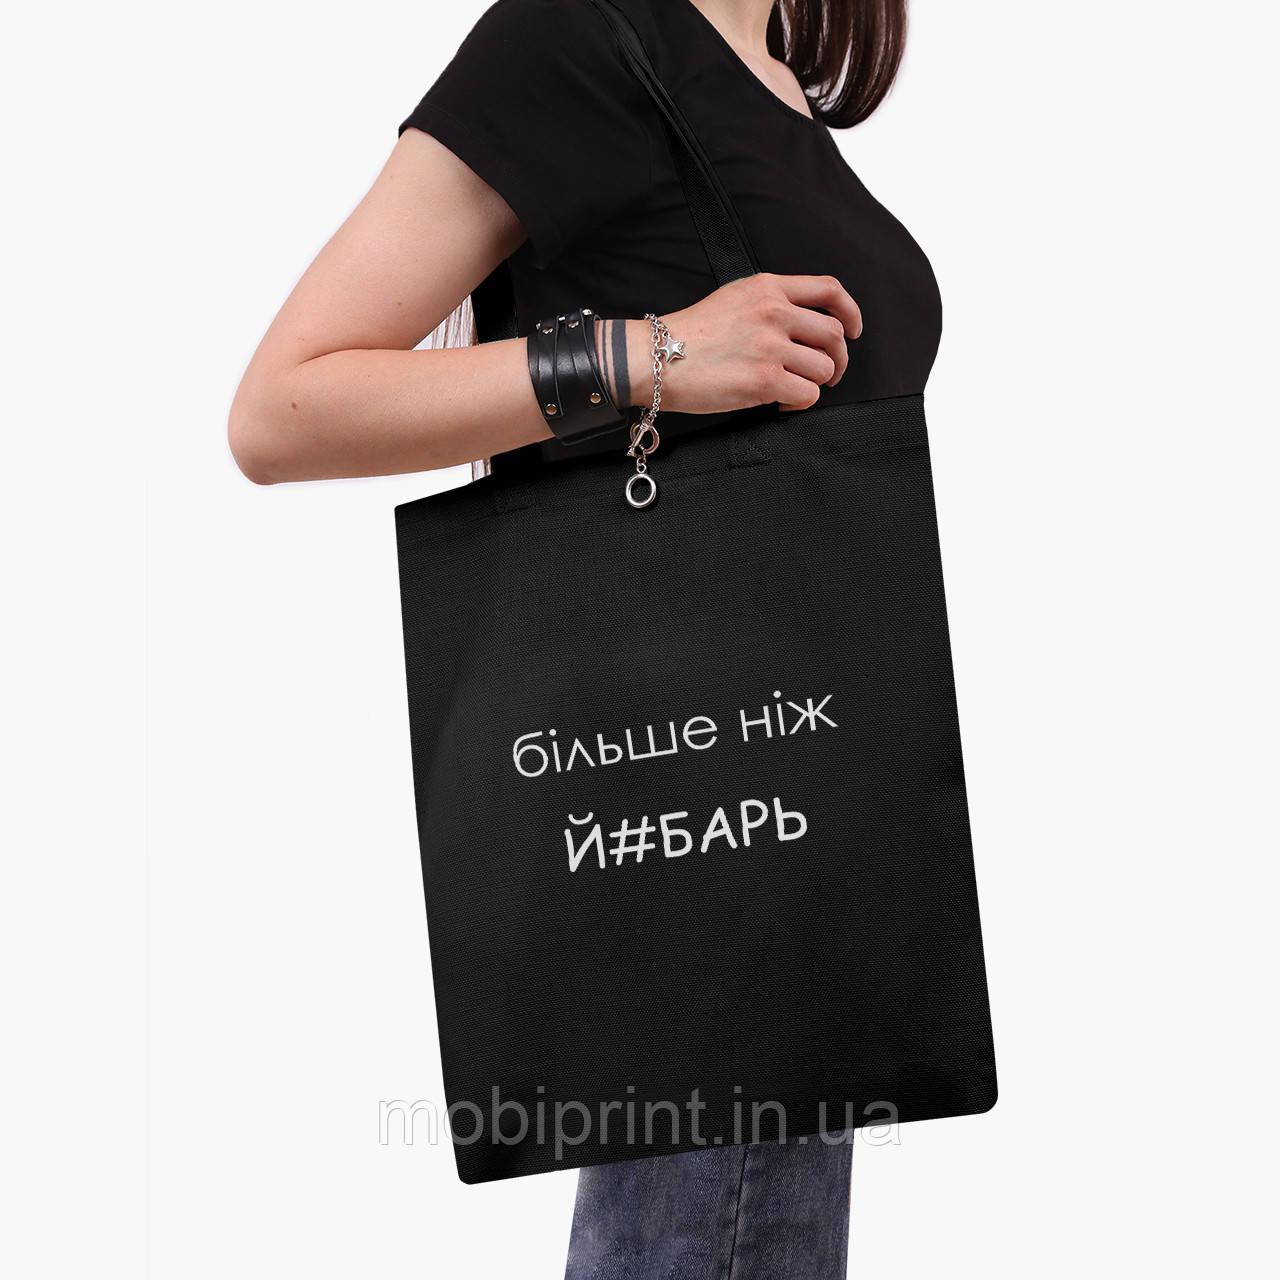 Эко сумка шоппер черная Більше ніж… (More) (9227-1284-2) экосумка шопер 41*35 см